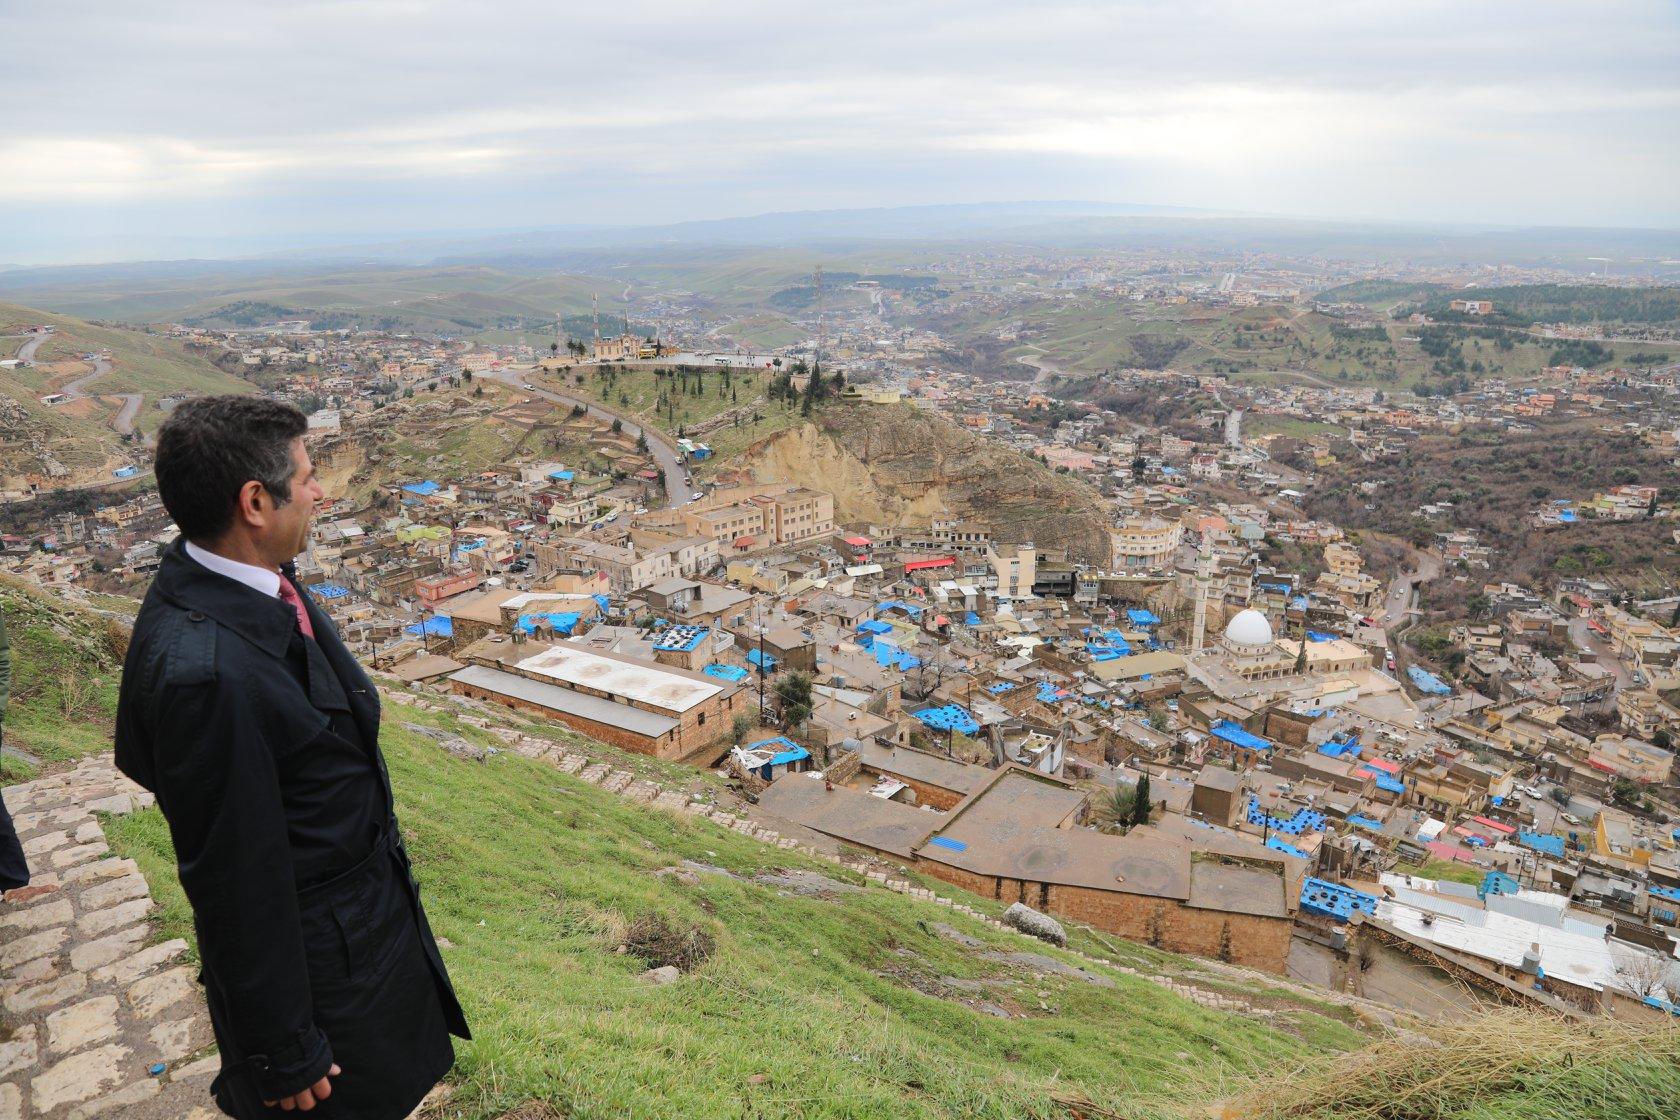 A new US consul general in Erbil